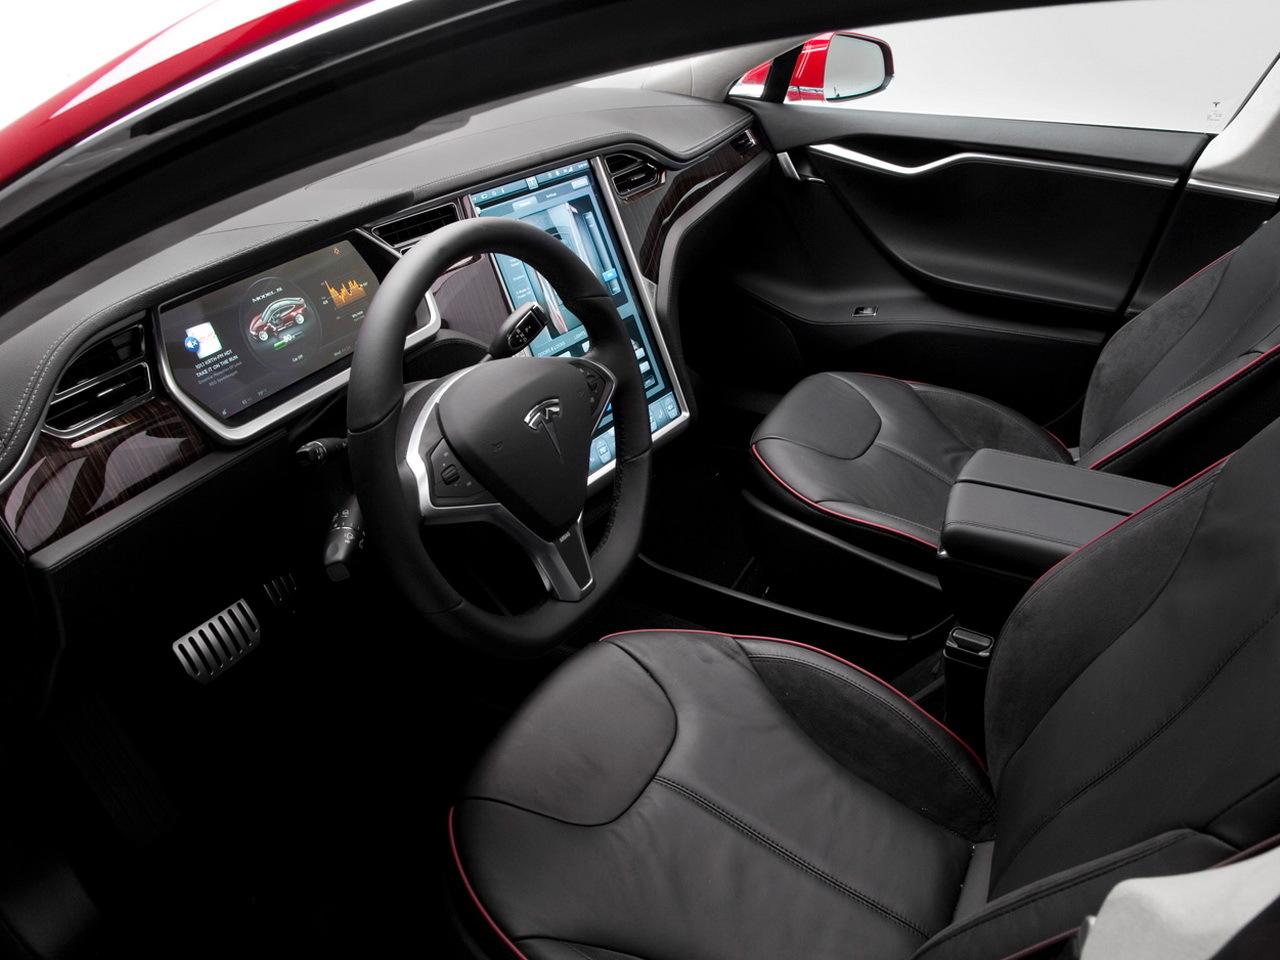 2012 Tesla Model S 60D interior